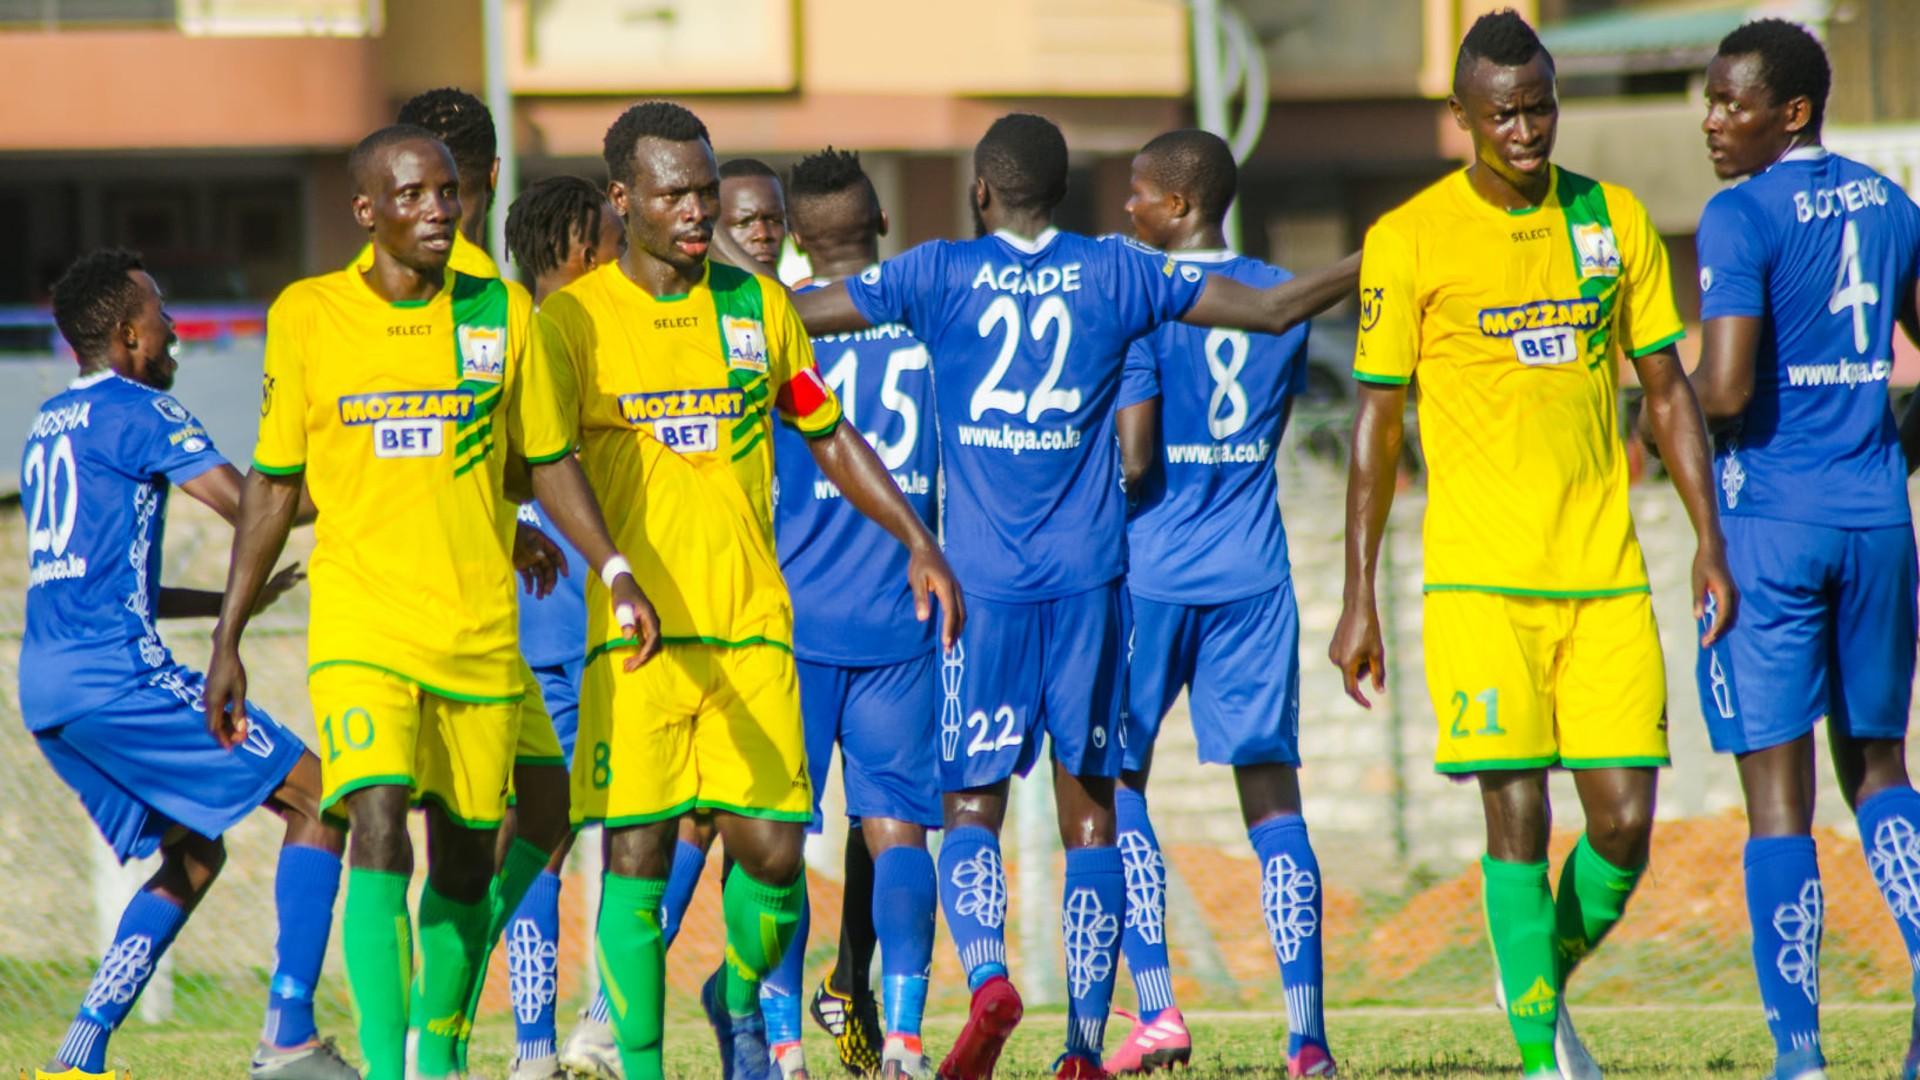 Mudavadi: Why Kakamega Homeboyz should have beaten Bandari